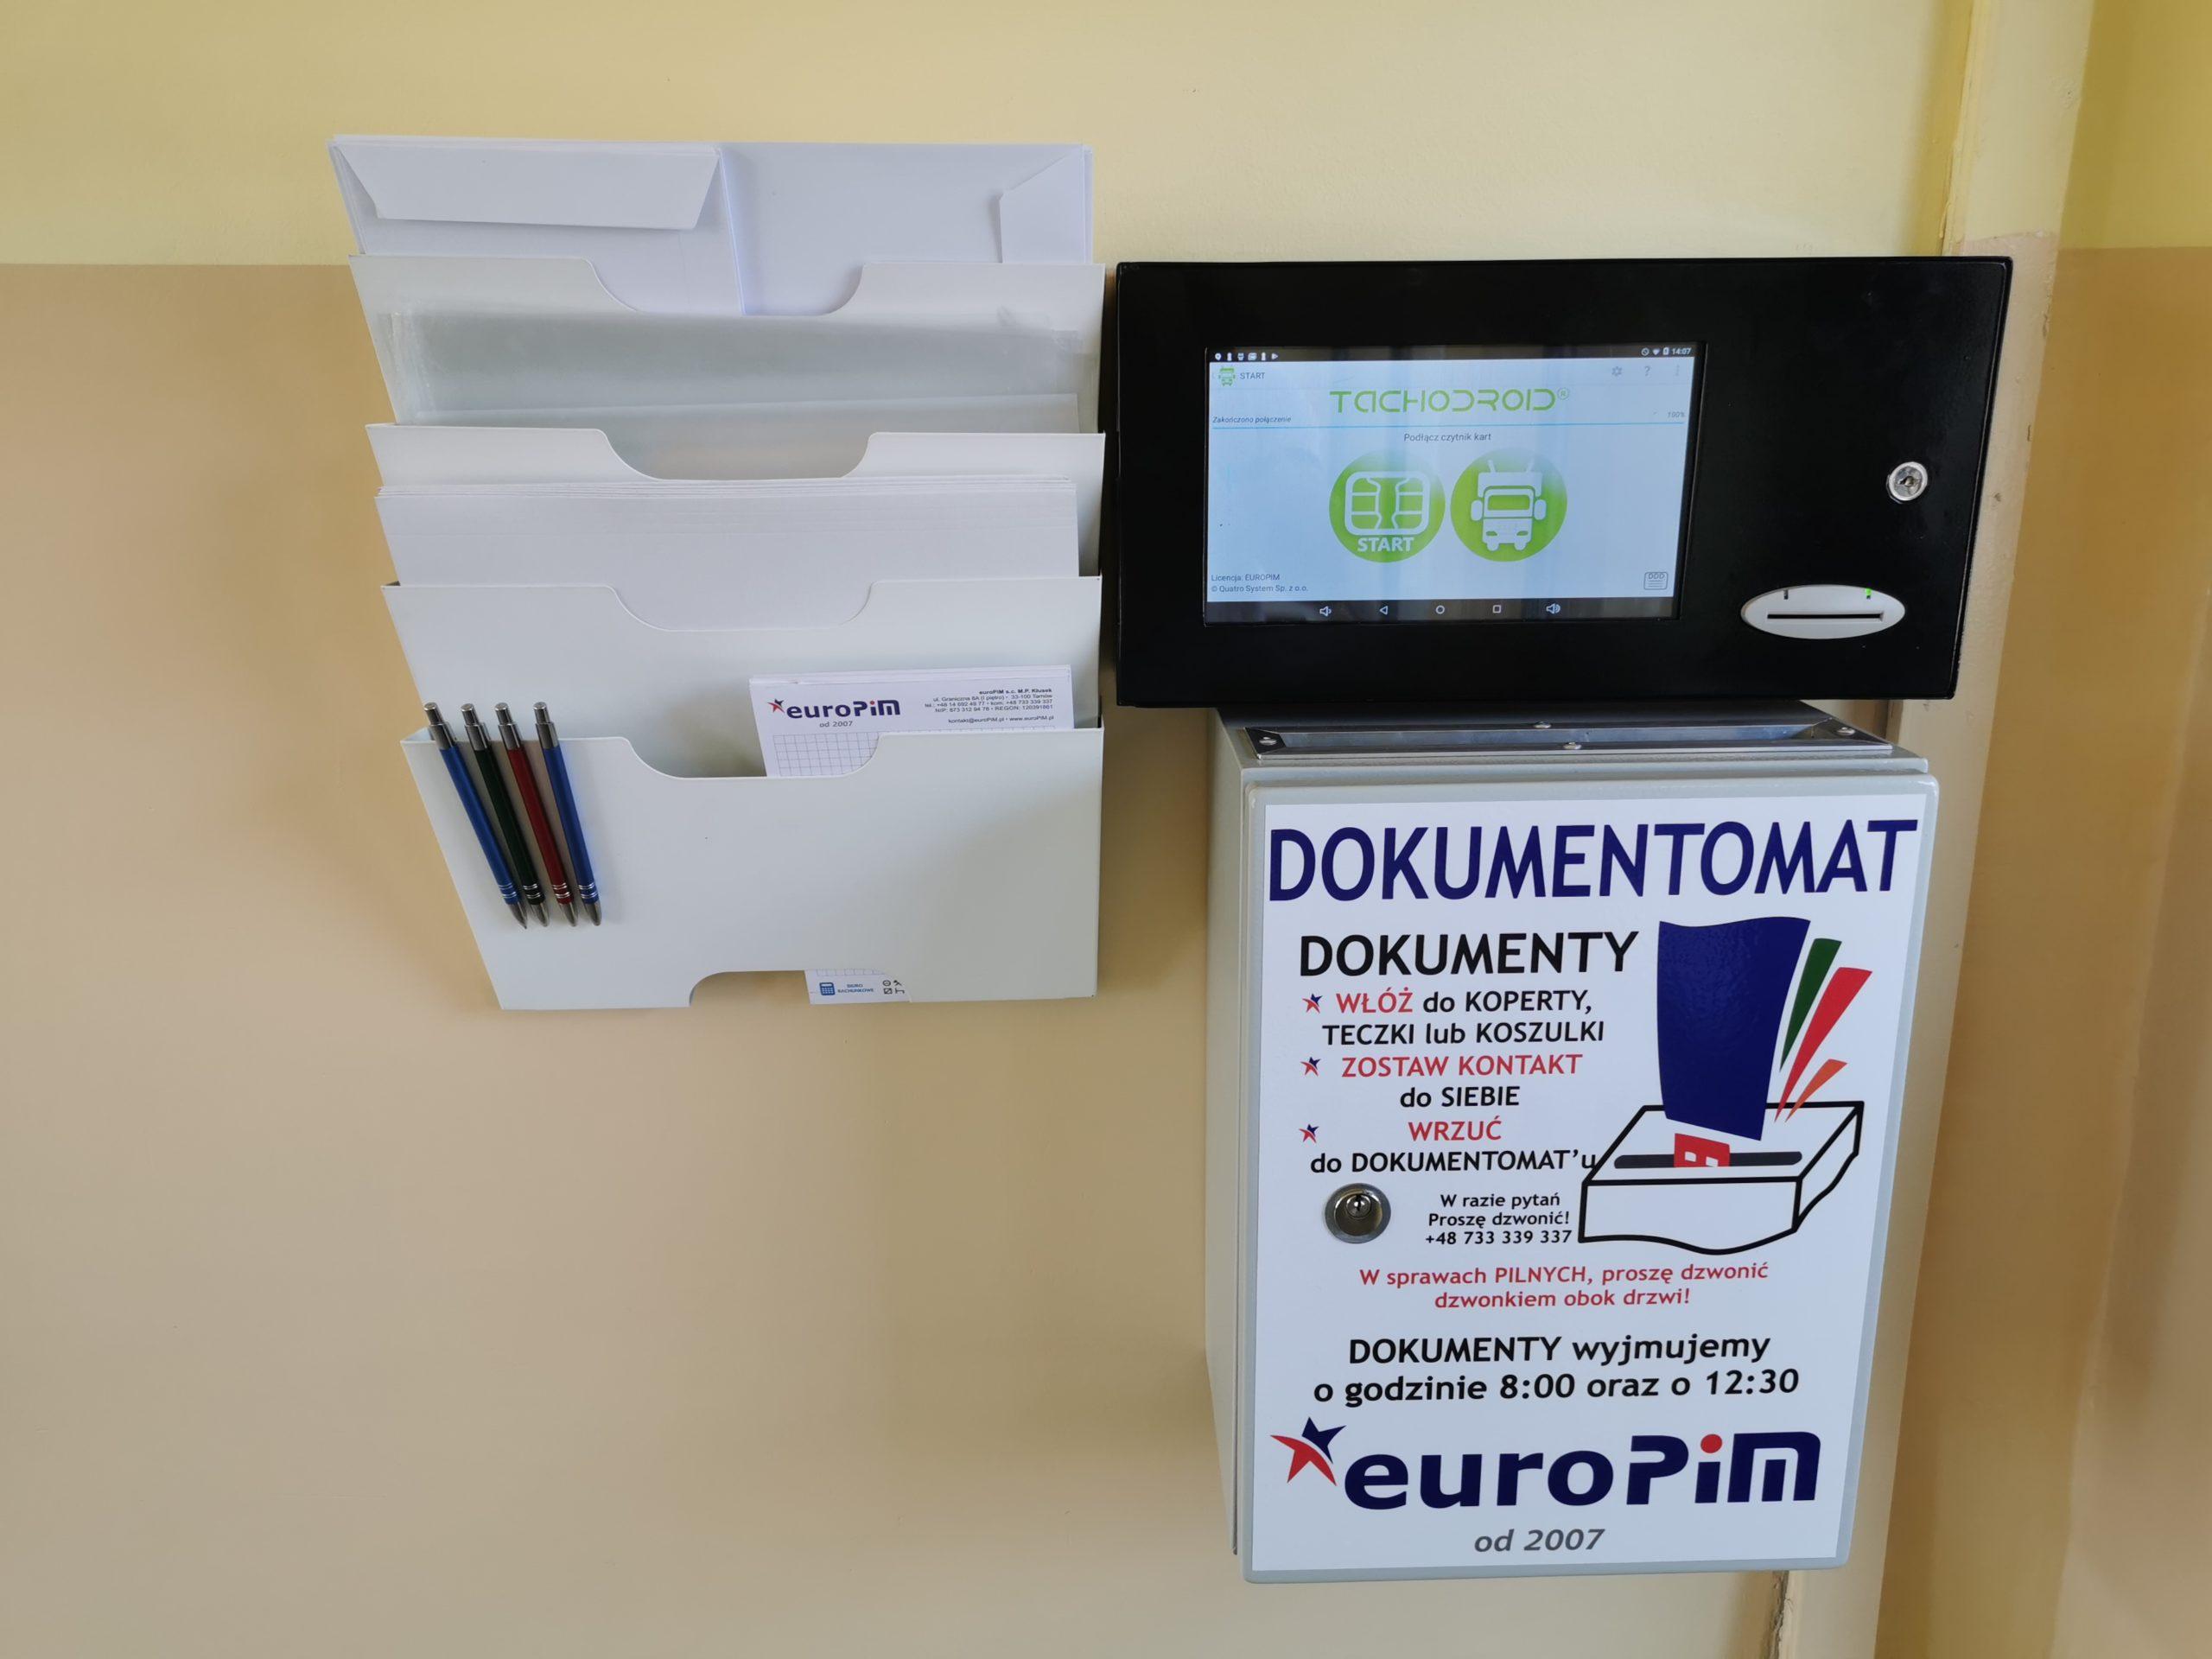 DOKUMENTOMAT – nowa organizacja pracy – euroPiM